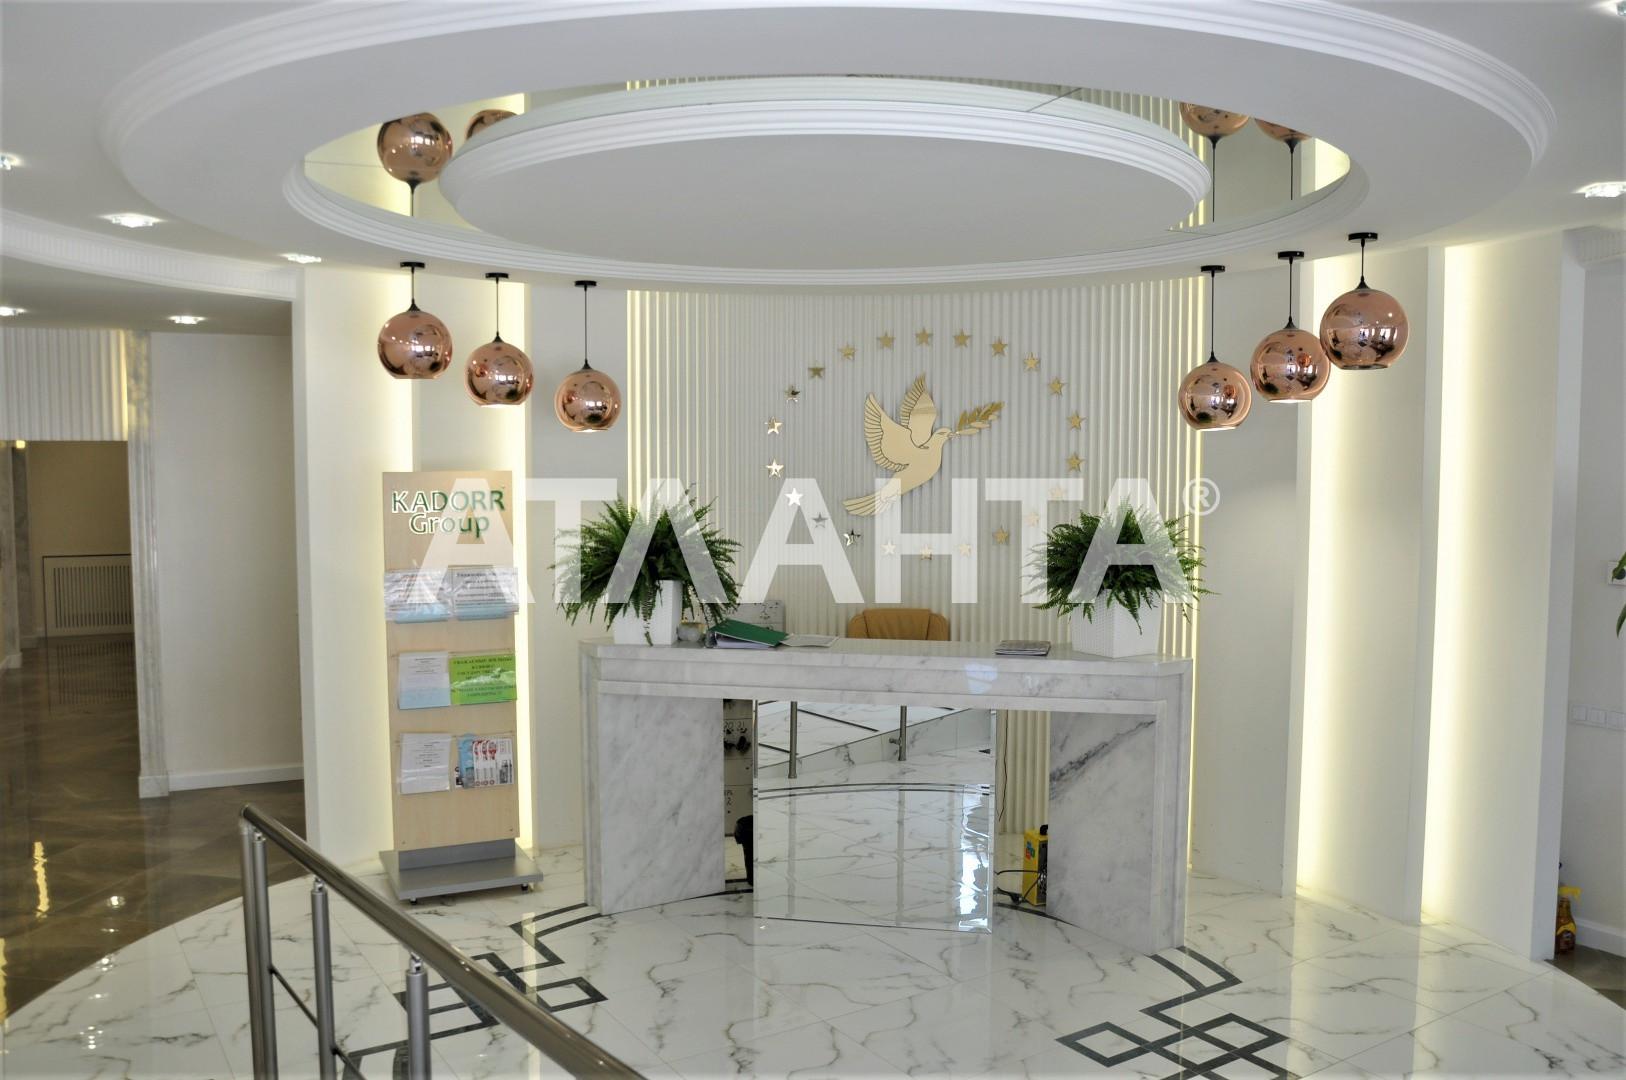 Продается 1-комнатная Квартира на ул. Генуэзская — 55 800 у.е. (фото №2)